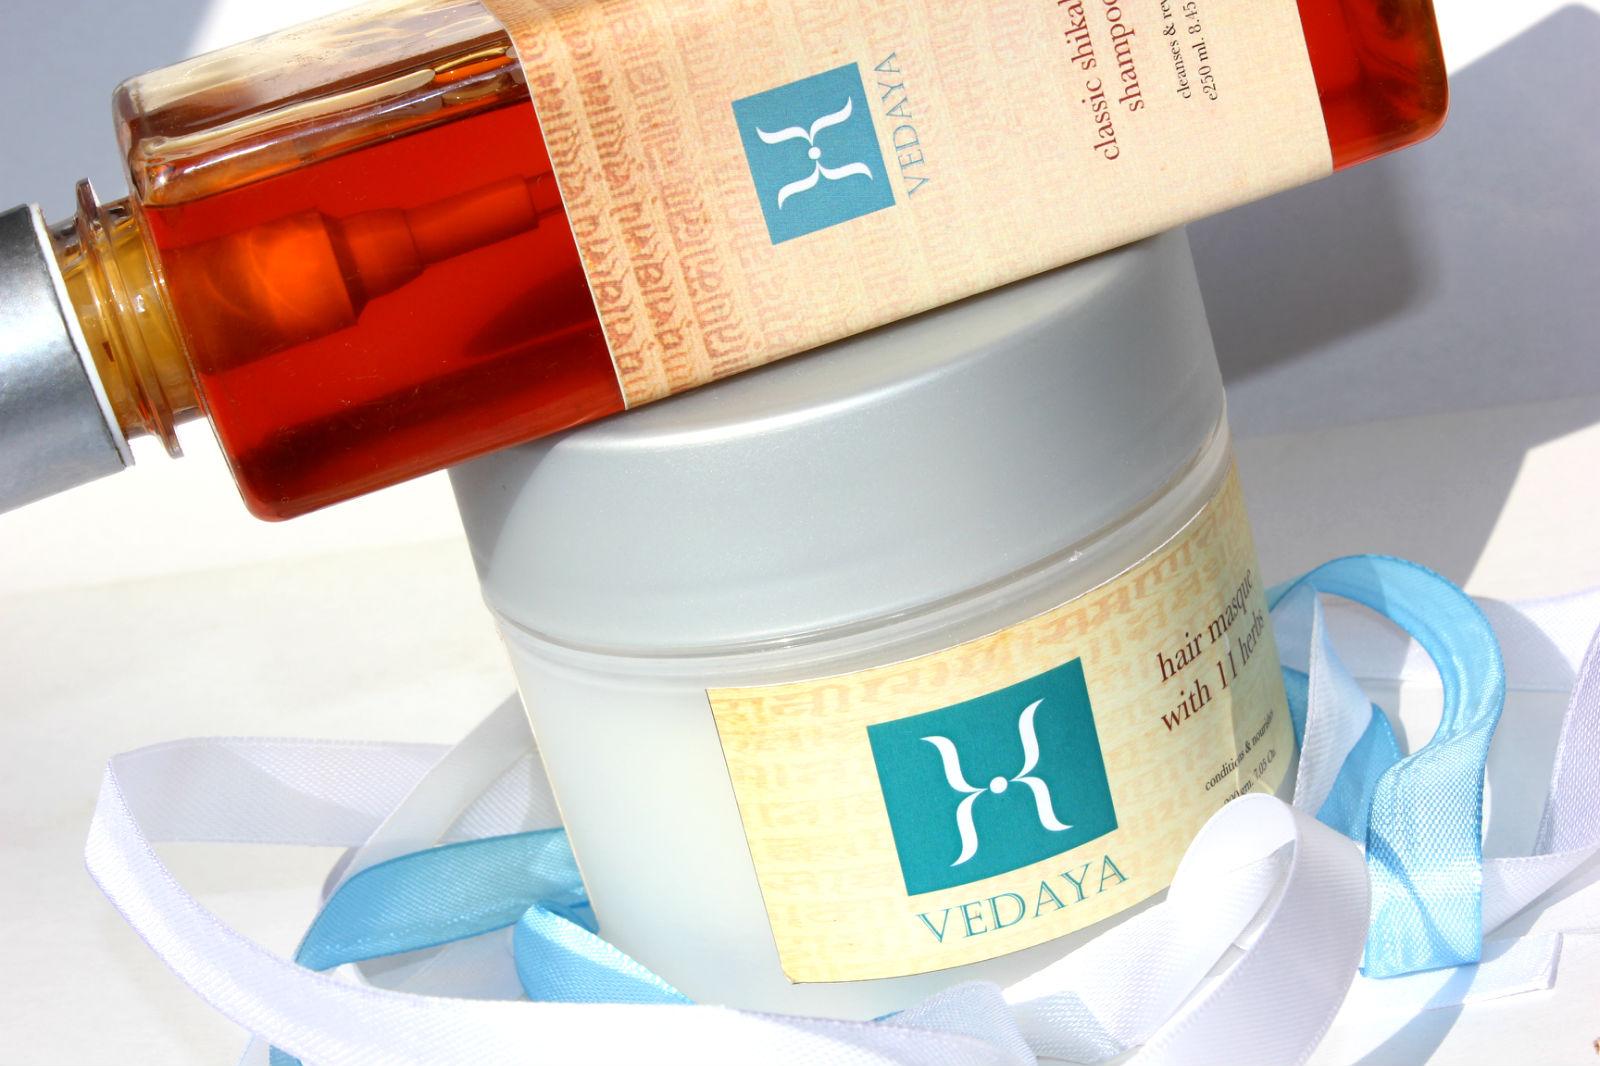 Отзыв: Красота по-индийски: Классический Шикакай Шампунь и Маска для волос 11 трав. VEDAYA Classic shikakai shampoo and Hair masque with 11 herbs.